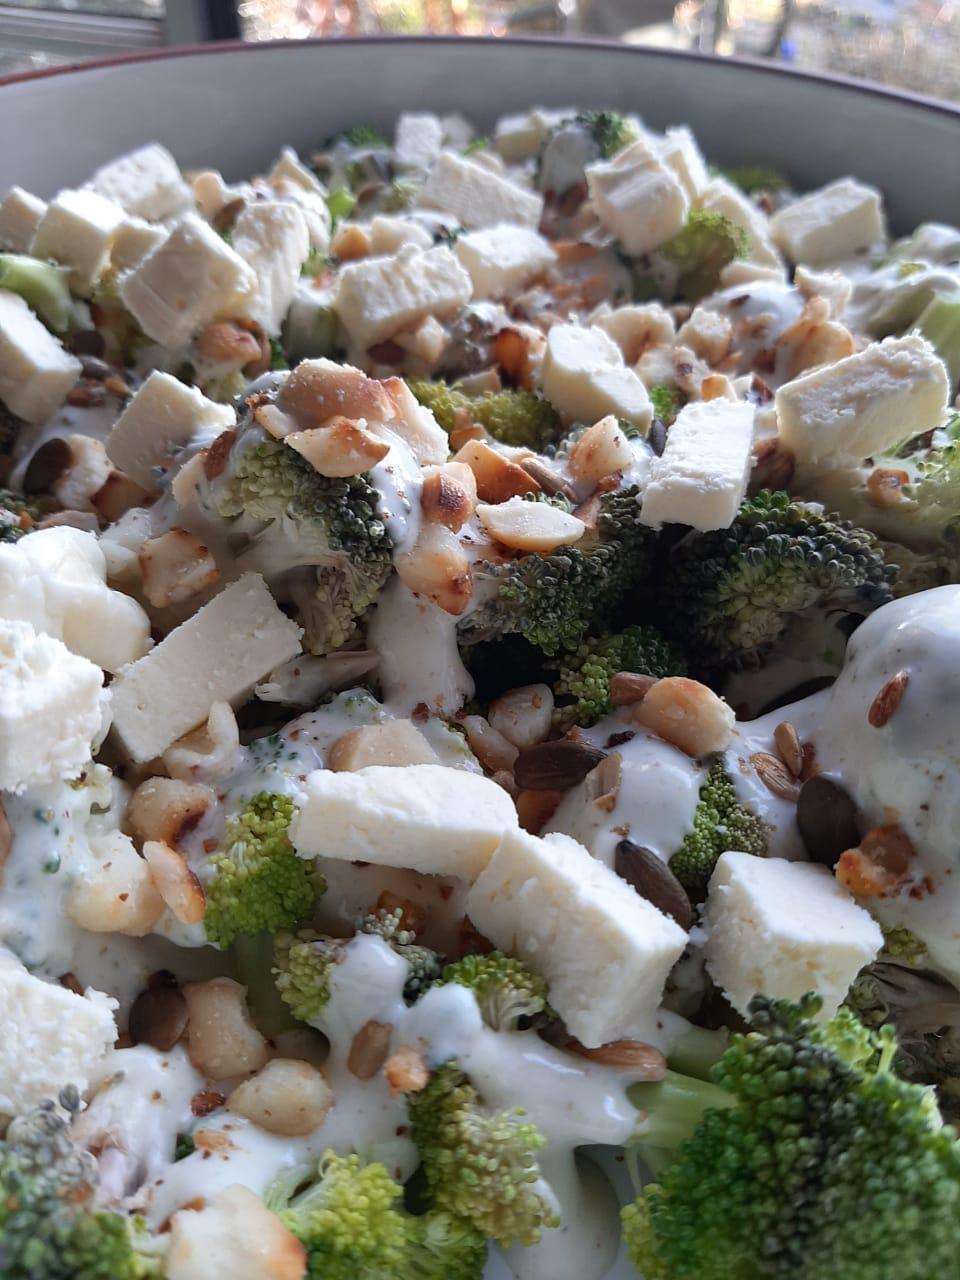 Lorraine's Broccoli Macadamia Salad with a Cumin Yogurt Dressing